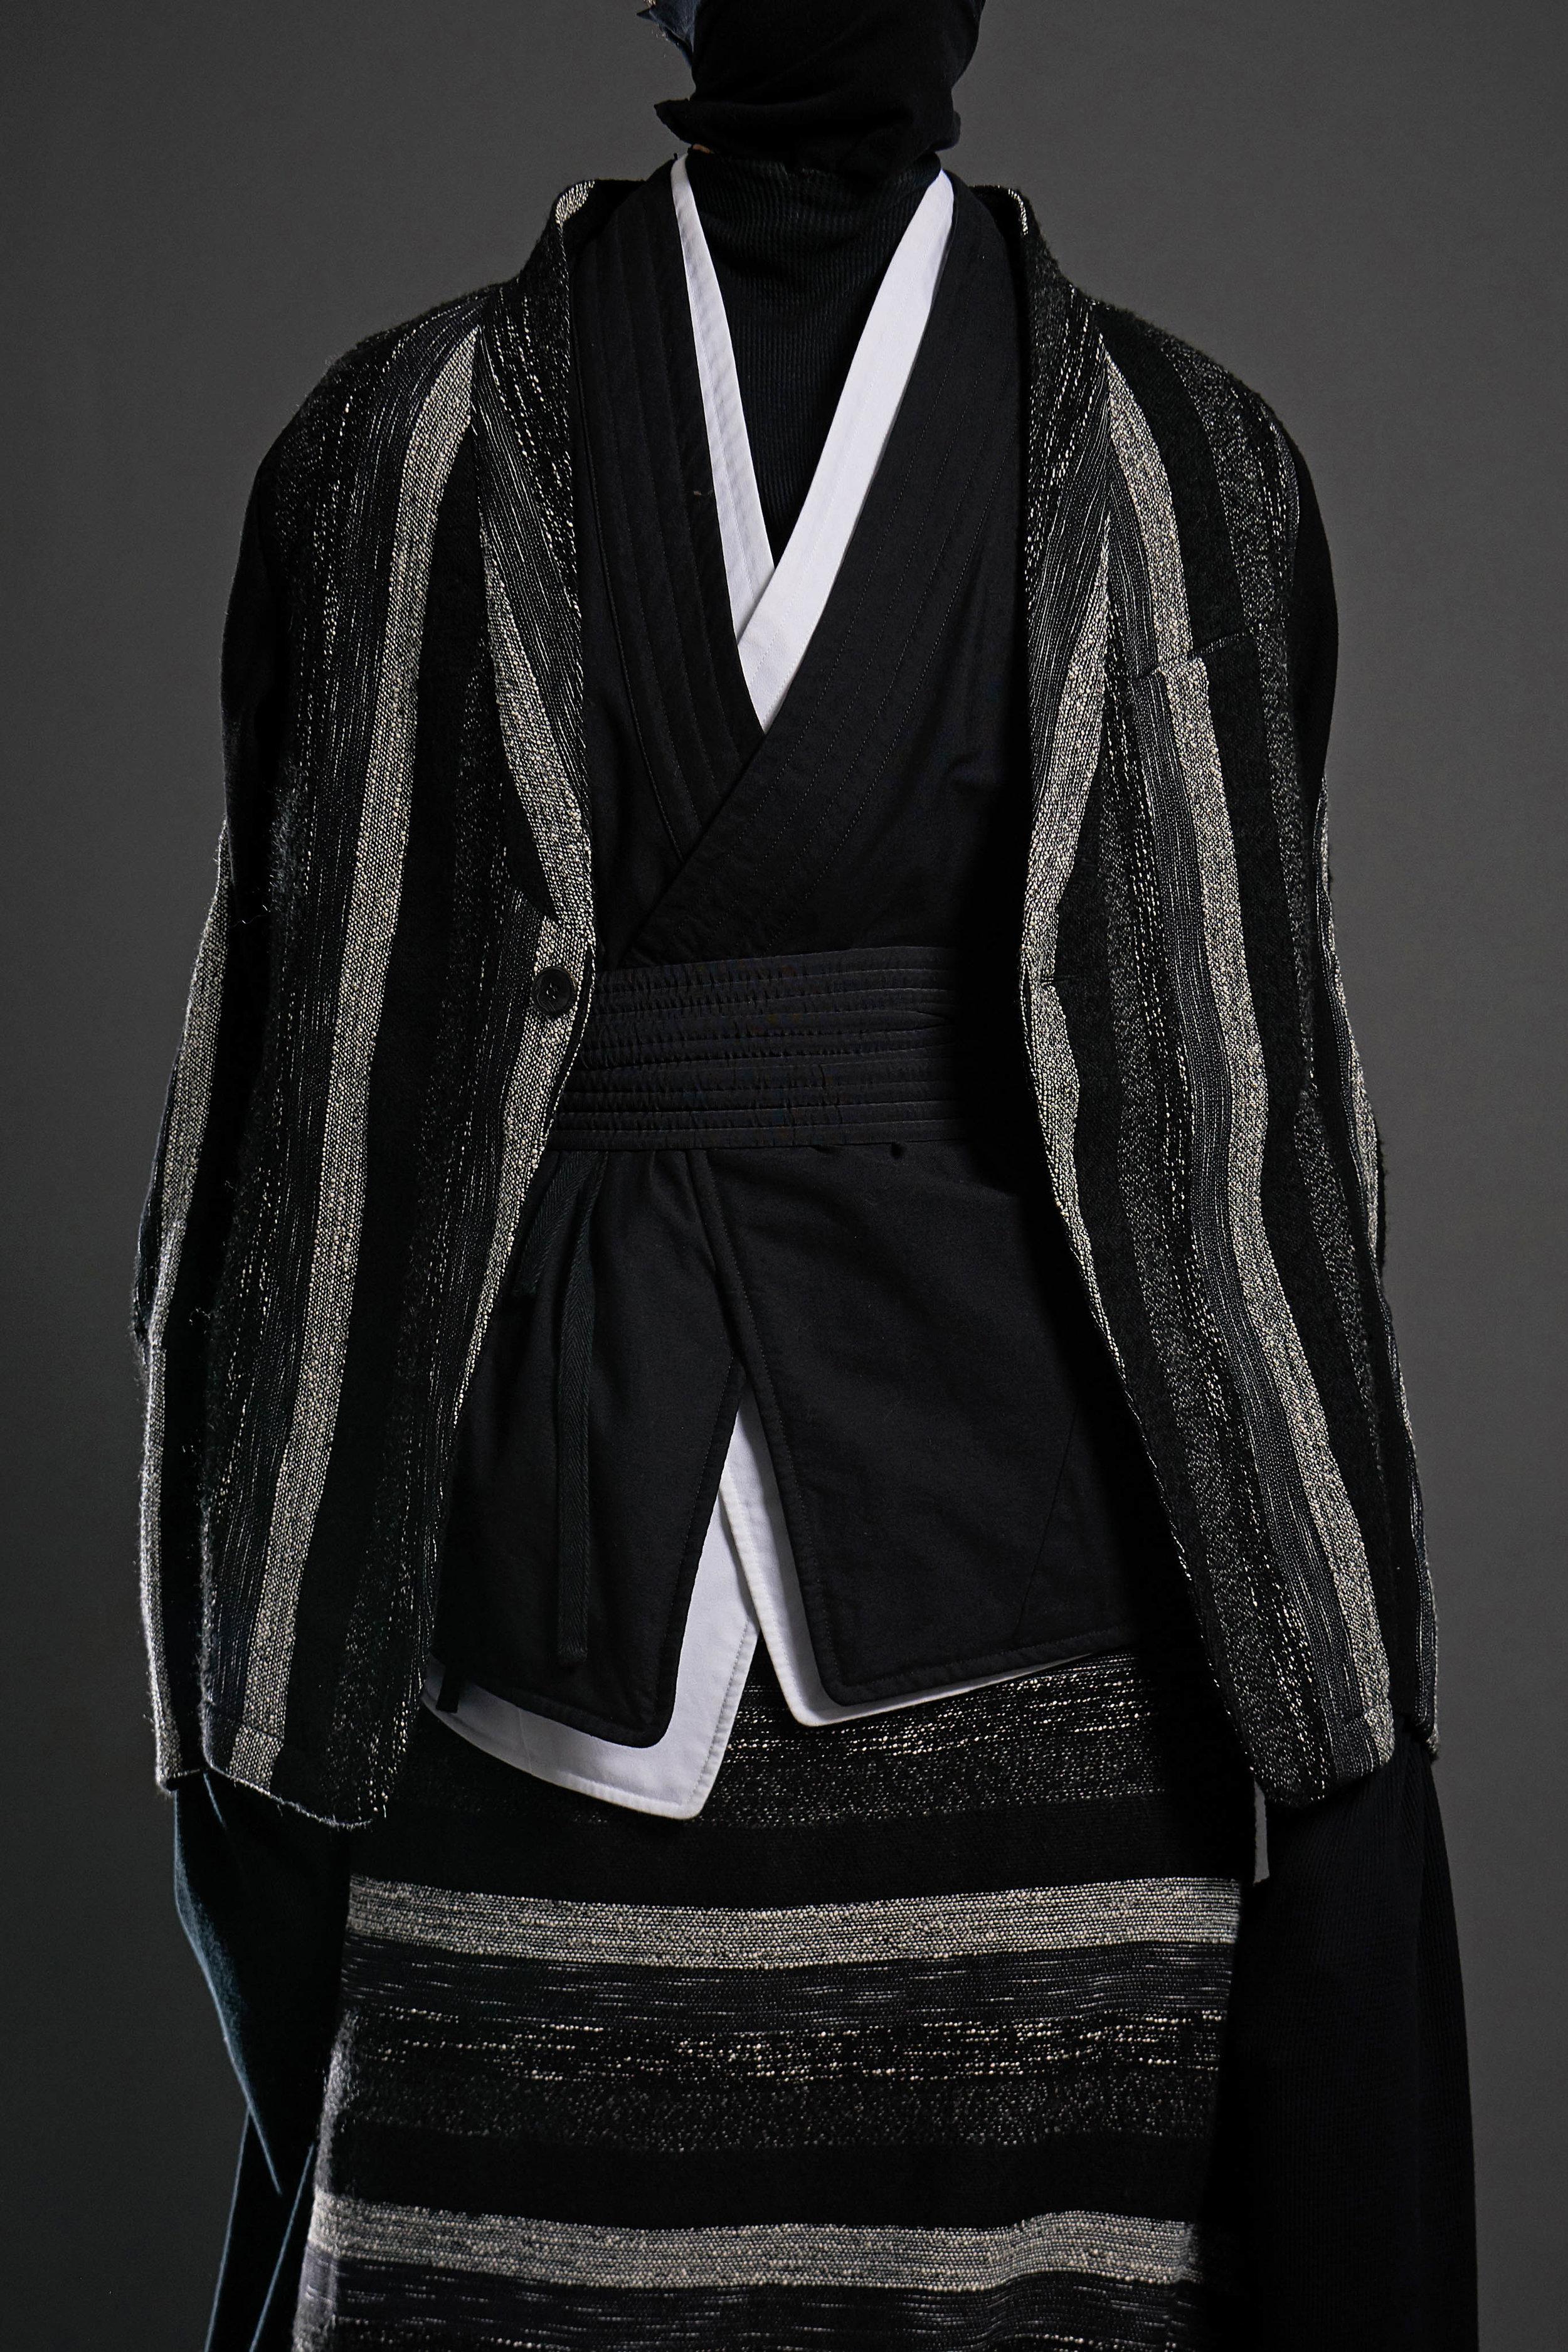 Look 4   ARC Jacket 6  / Black and White Melange   ARC Kimono Shirt  / Black   ARC Kimono Shirt  / White   ARC Obi Belt  / Black